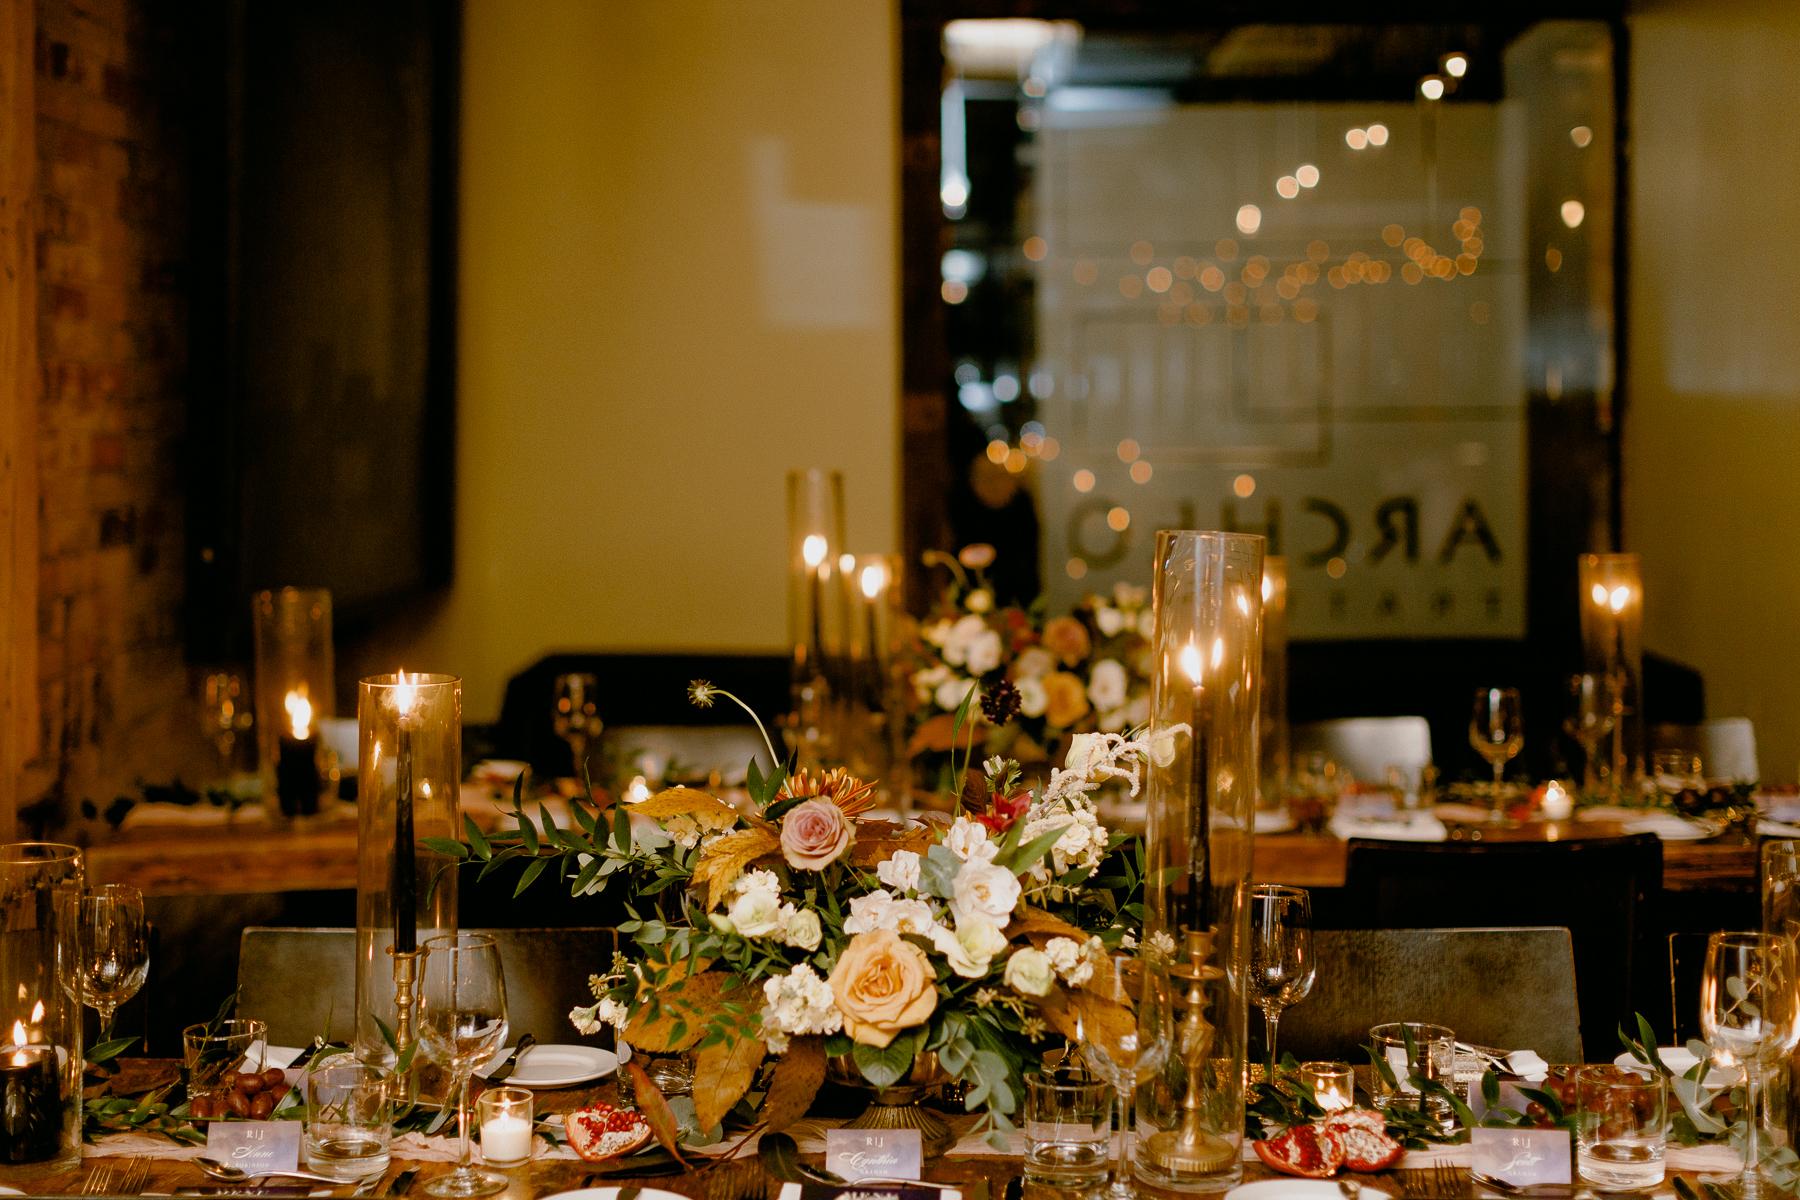 flower-decoration-for-wedding-reception 0002.jpg